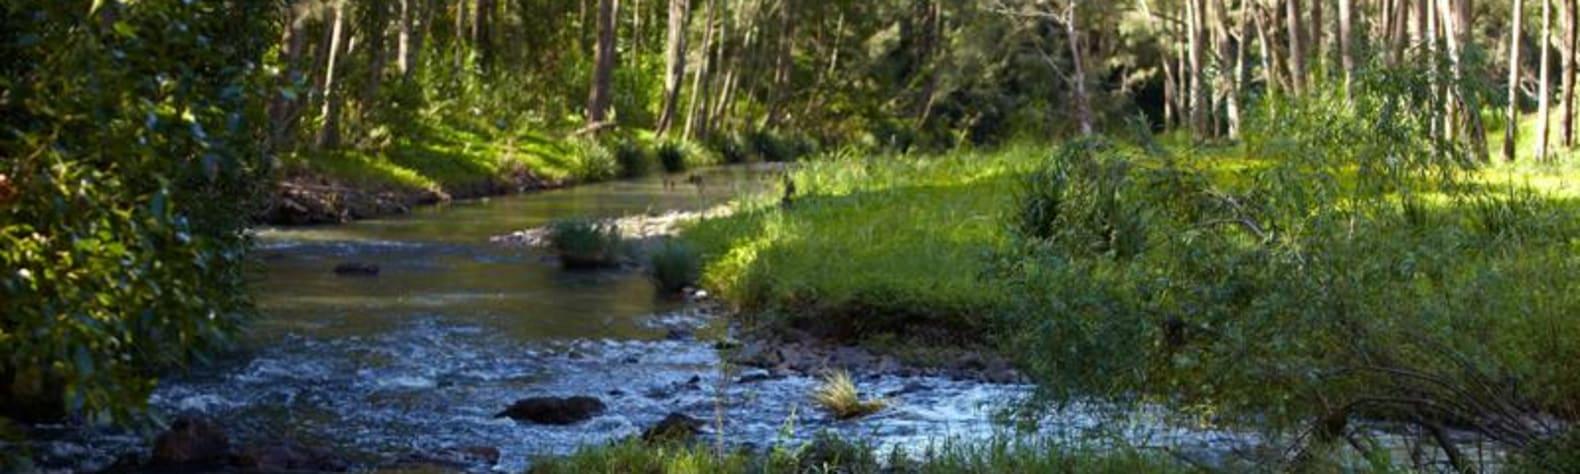 Tallebudgera Valley Sanctuary